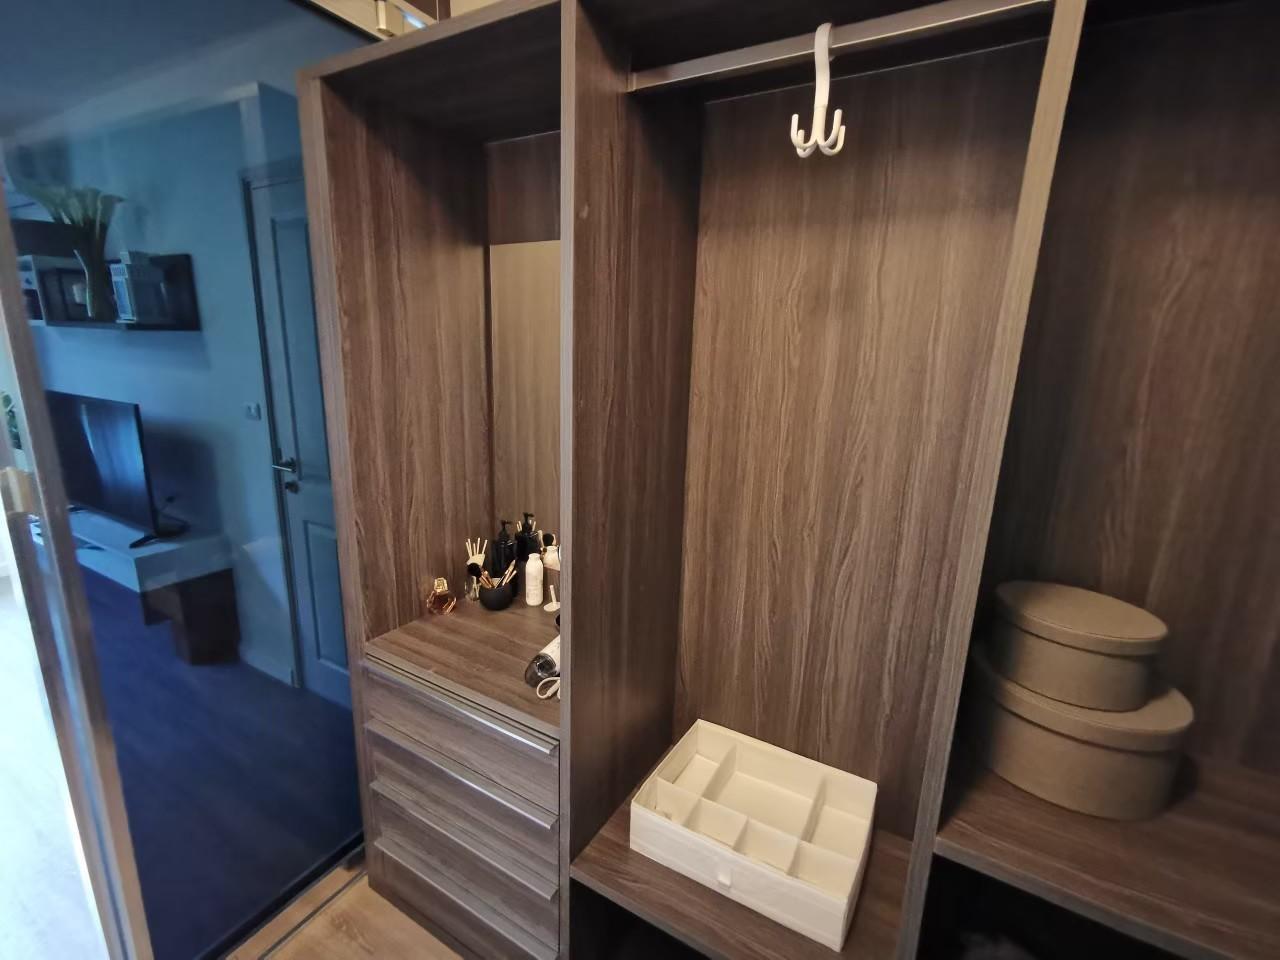 Poolcondo 2room  forfamily wall to mall 2 minute อพาร์ตเมนต์ 2 ห้องนอน 2 ห้องน้ำส่วนตัว ขนาด 65 ตร.ม. – ฟ้าฮ่าม